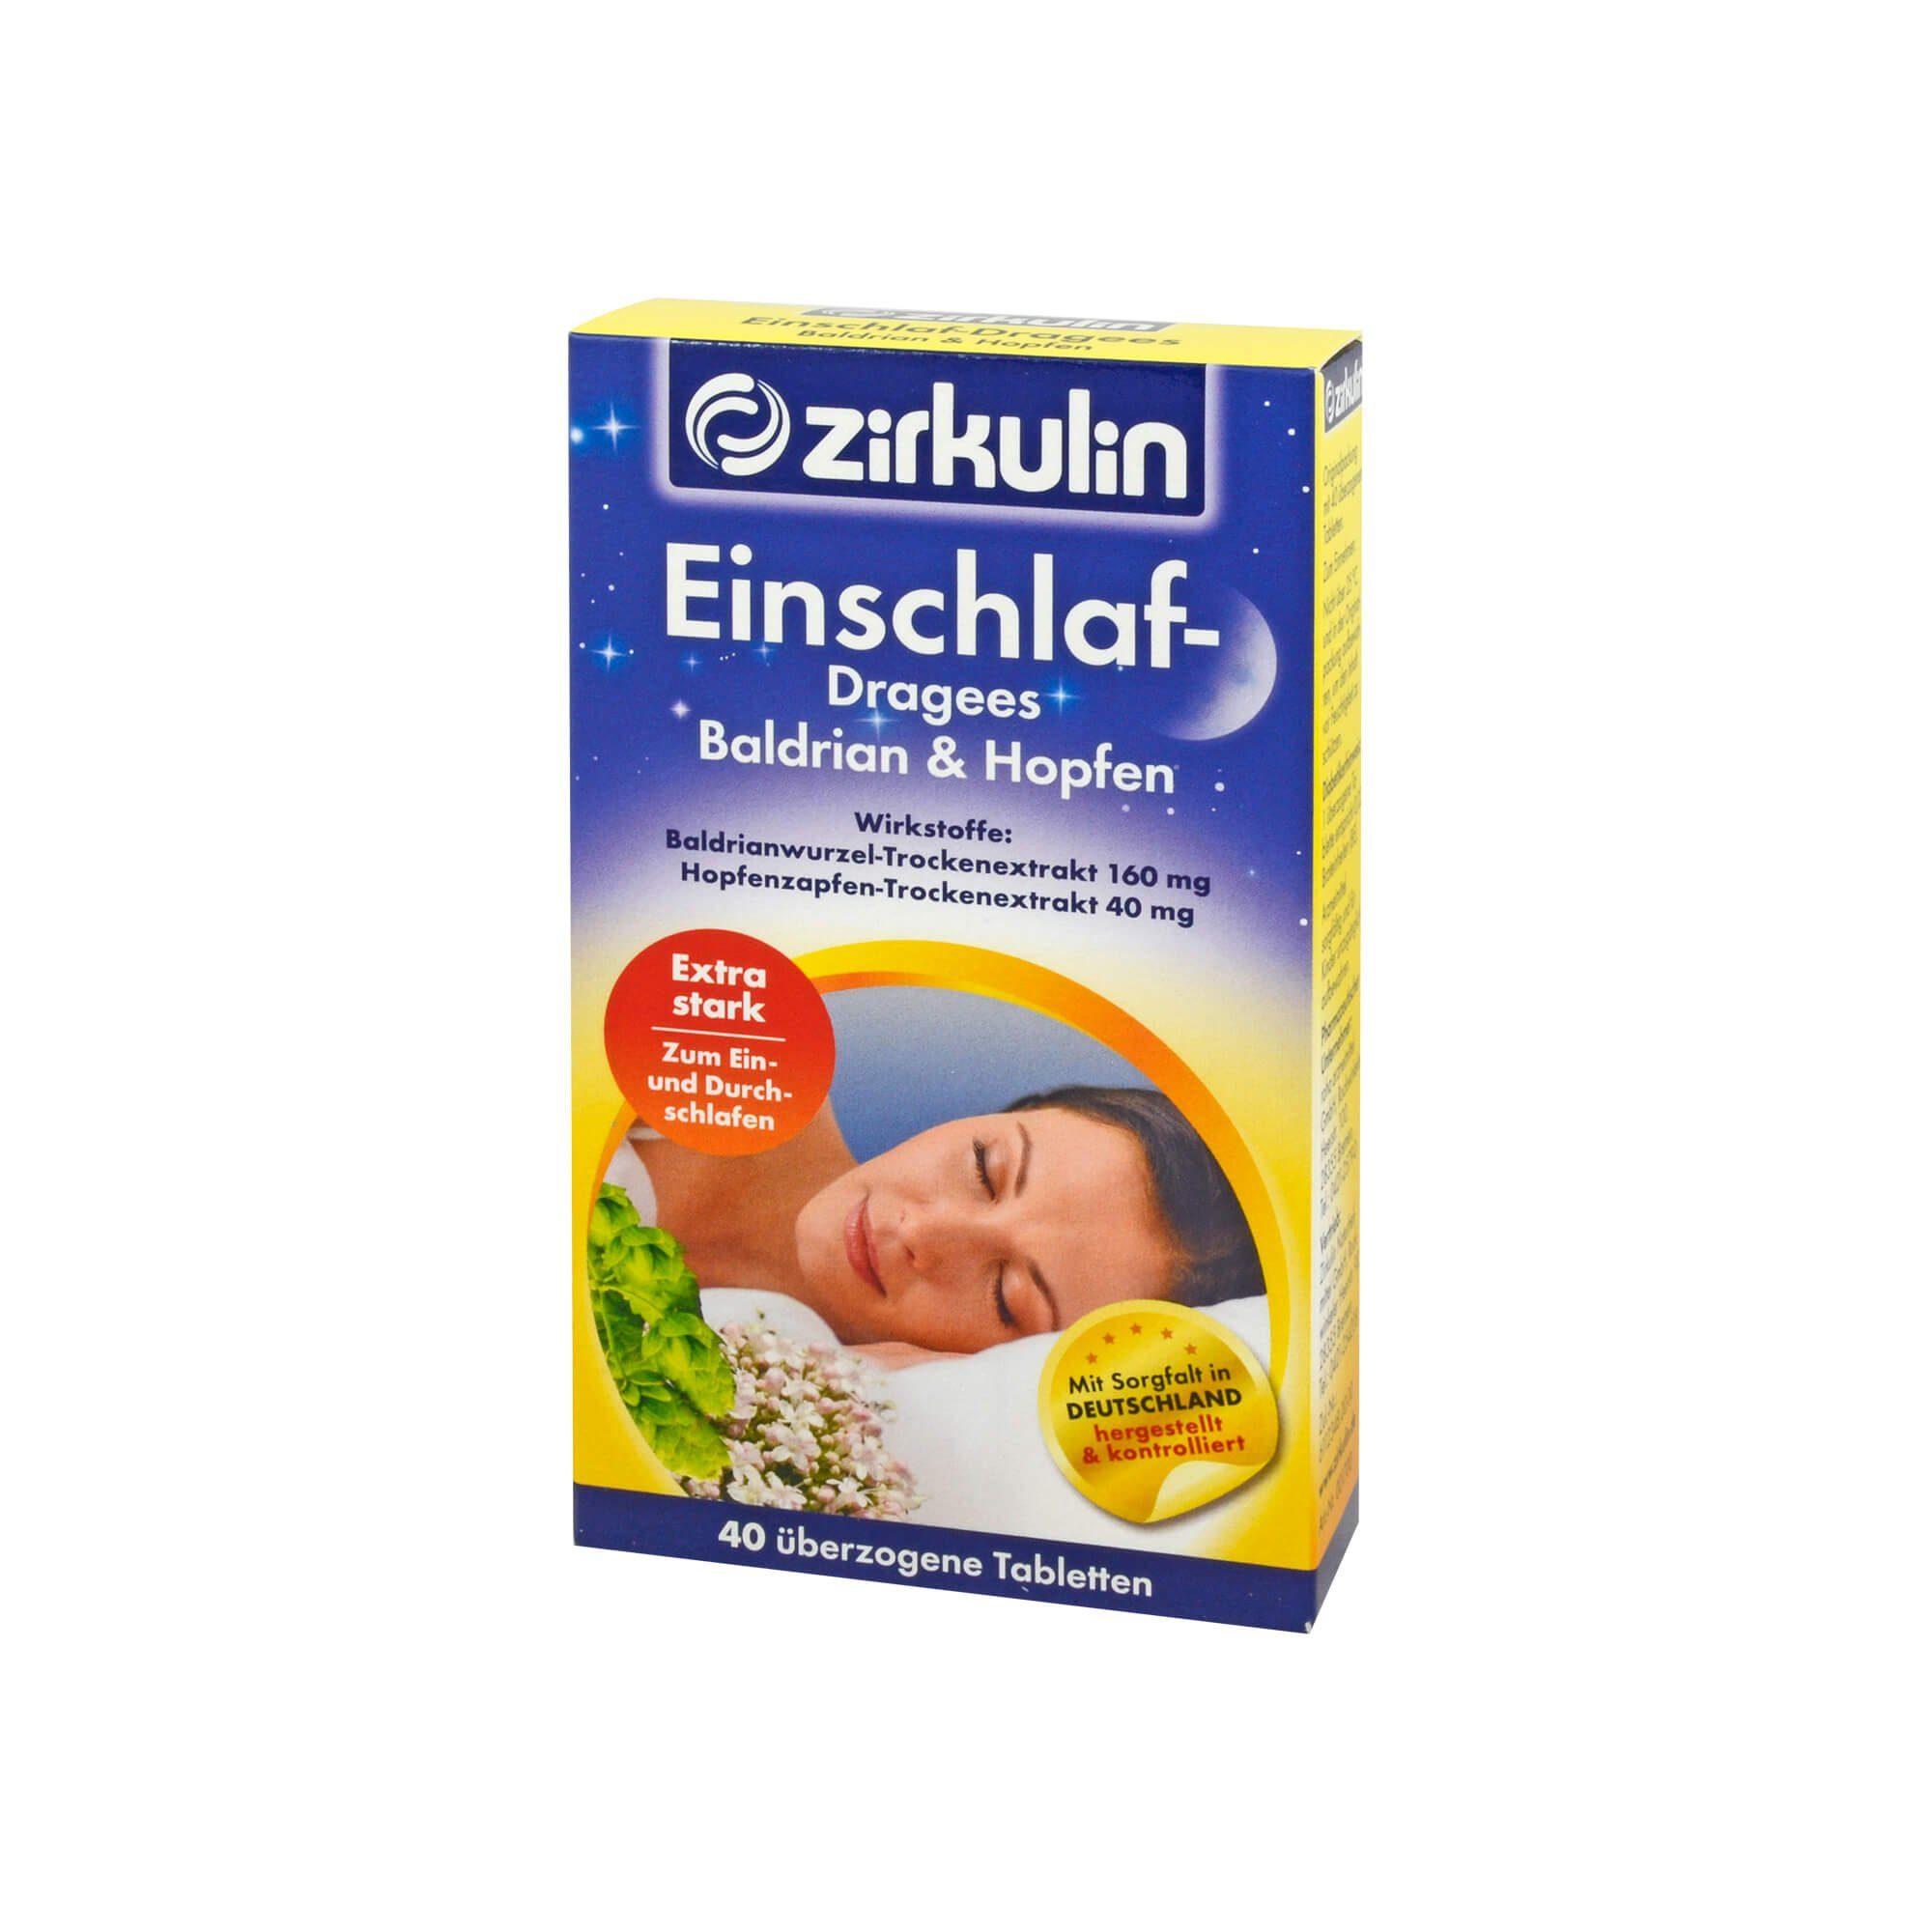 Zirkulin Einschlaf-Dragees Baldrian & Hopfen, 40 St